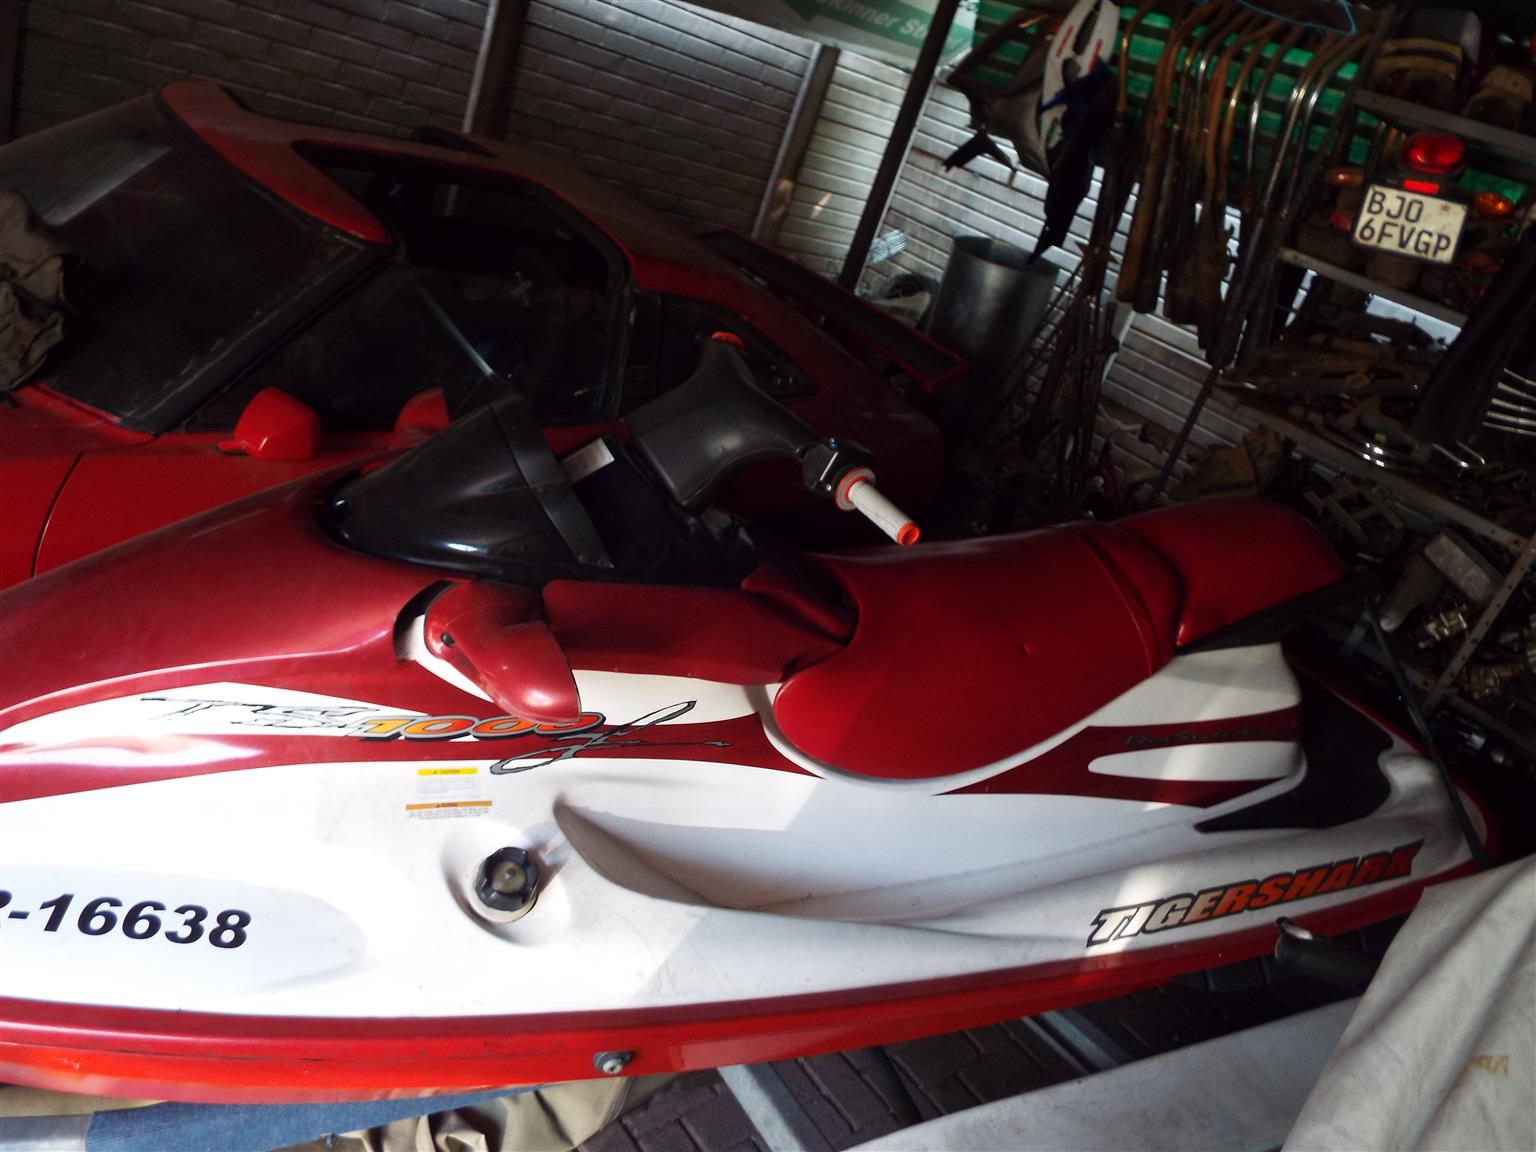 Tiger Shark TS 1000 Jet Ski